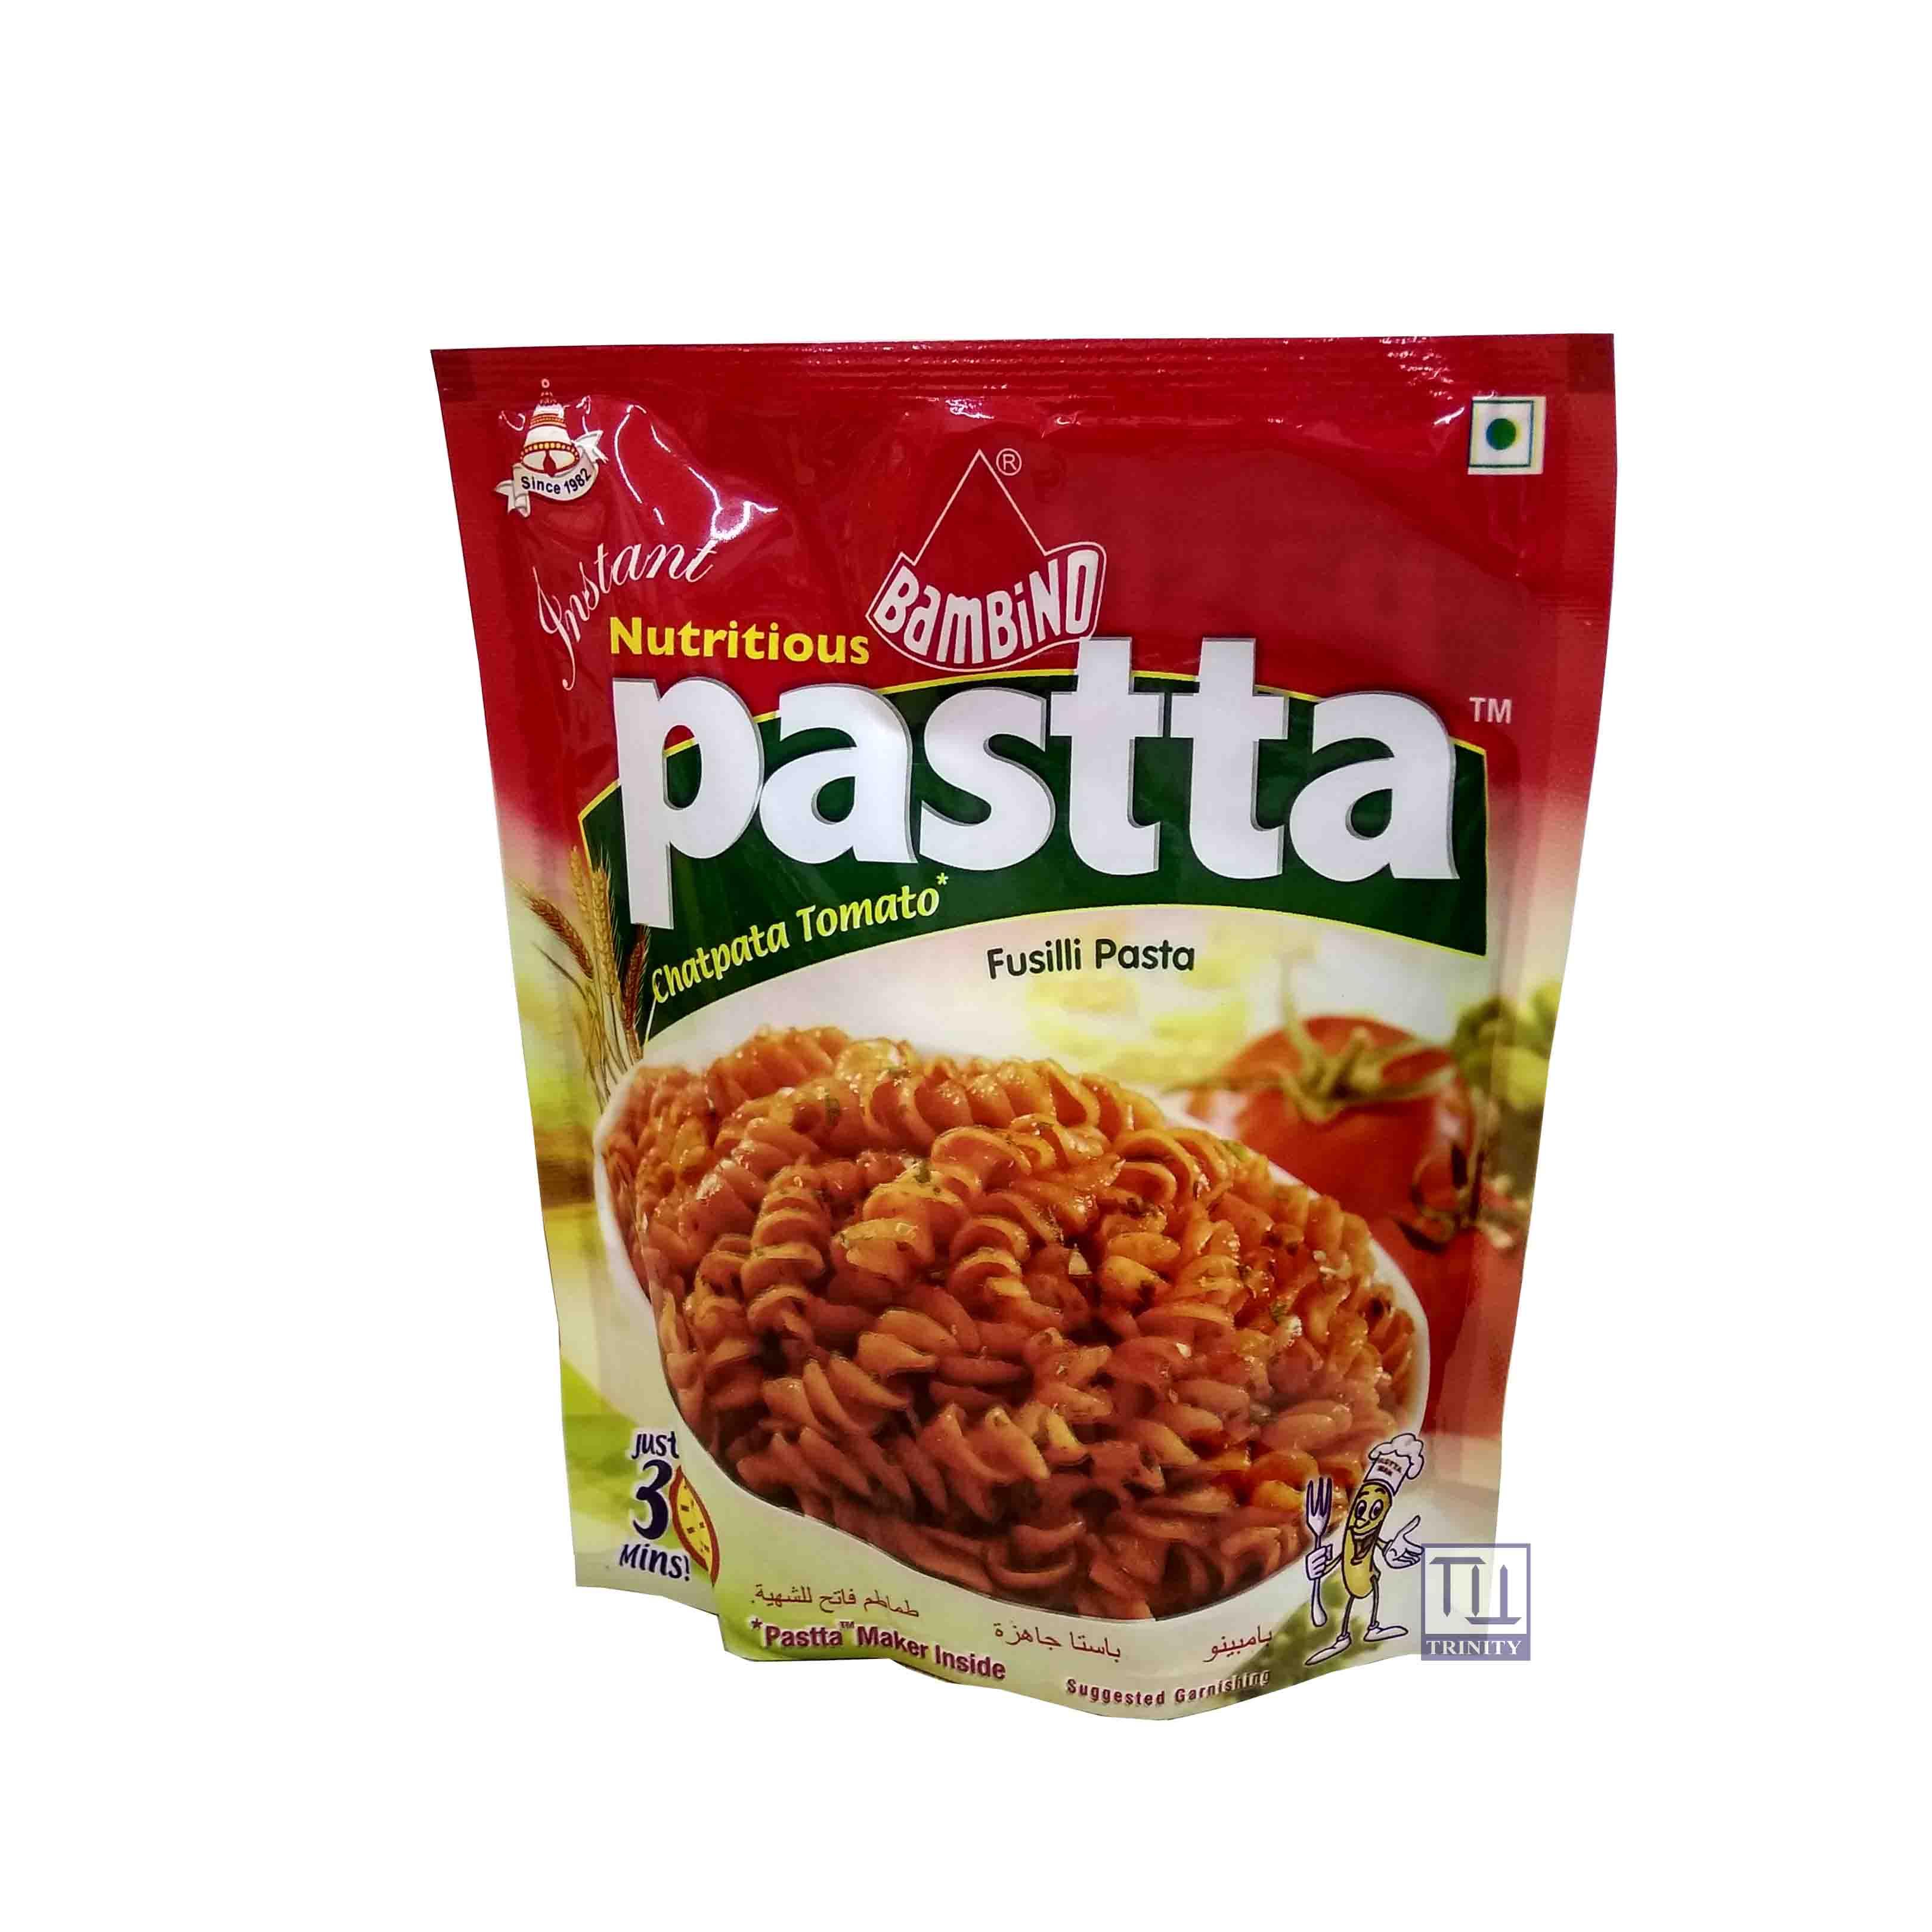 Bambino Instant Pasta Tomato Flavour 印度巴比諾即時調理粉 (蕃茄口味)